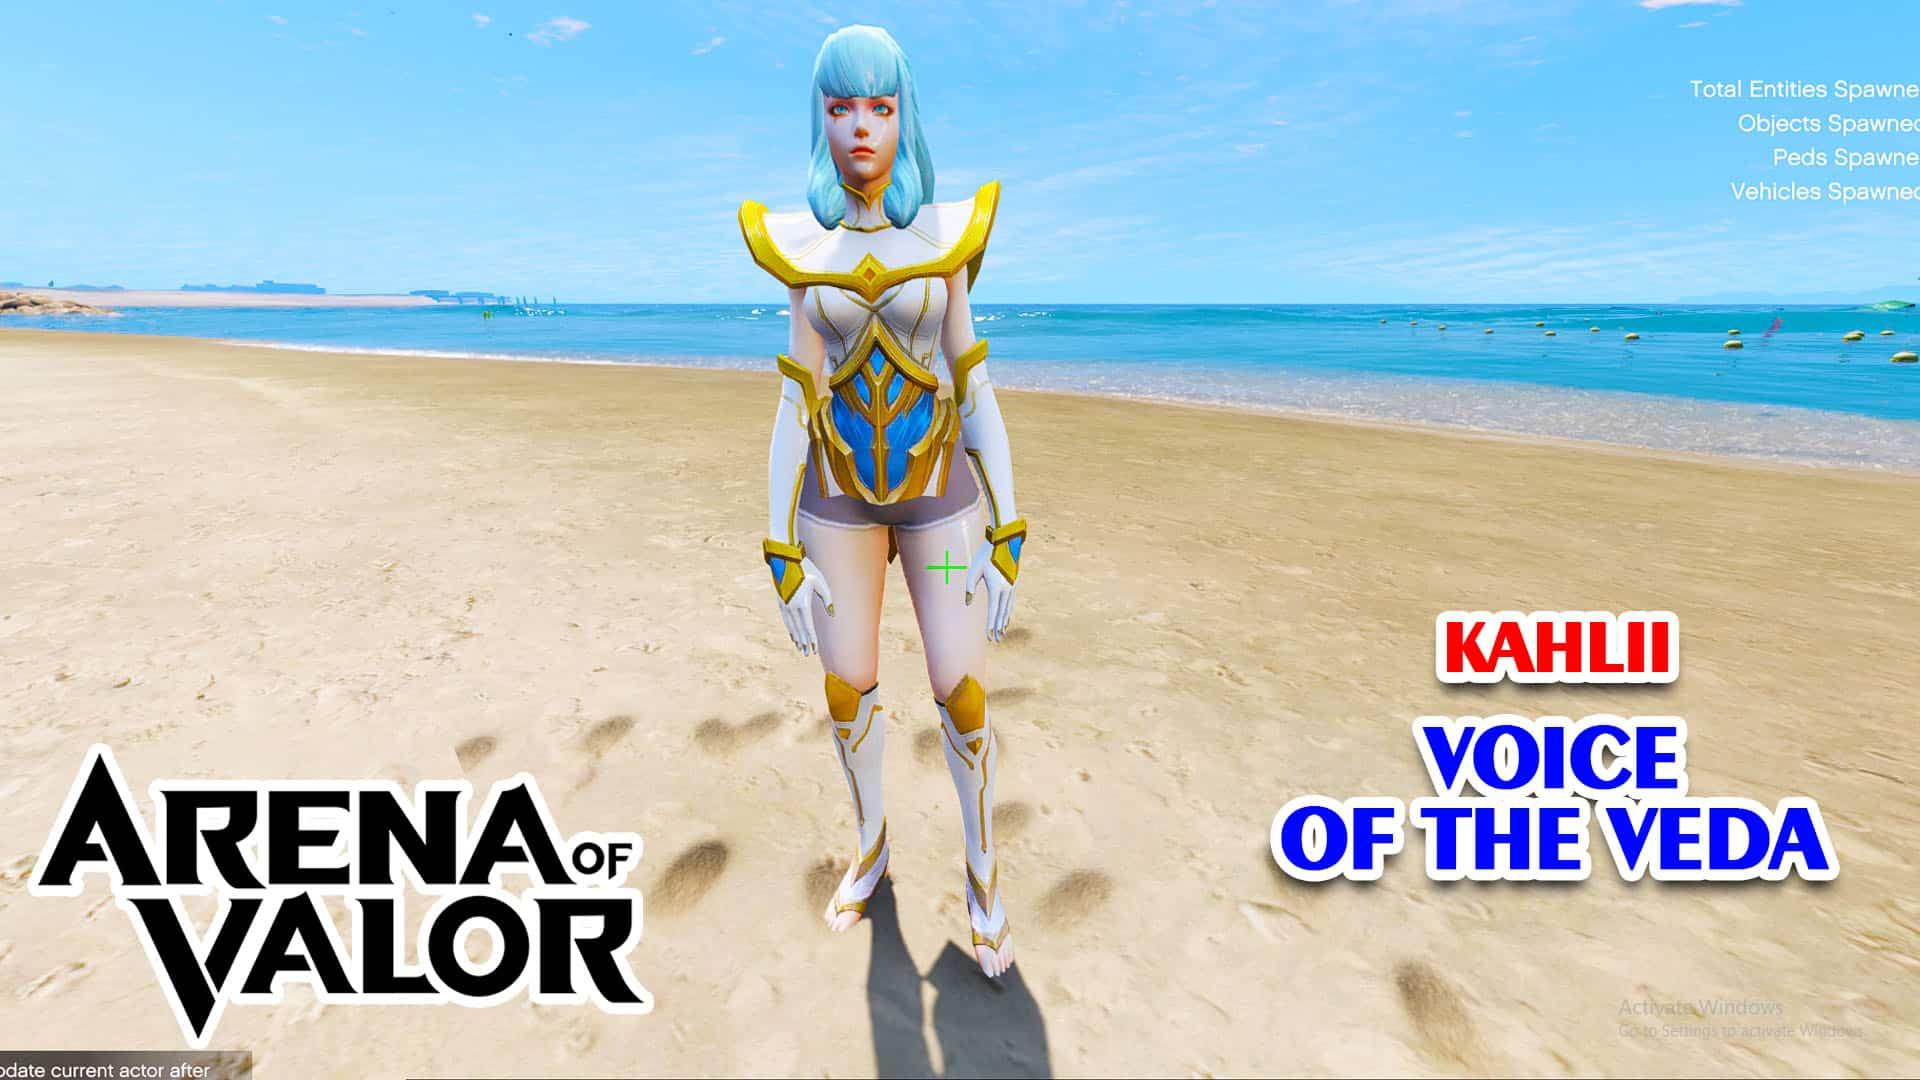 GTA 5 Mod Kahlii Voice of the Veda Arena of Valor